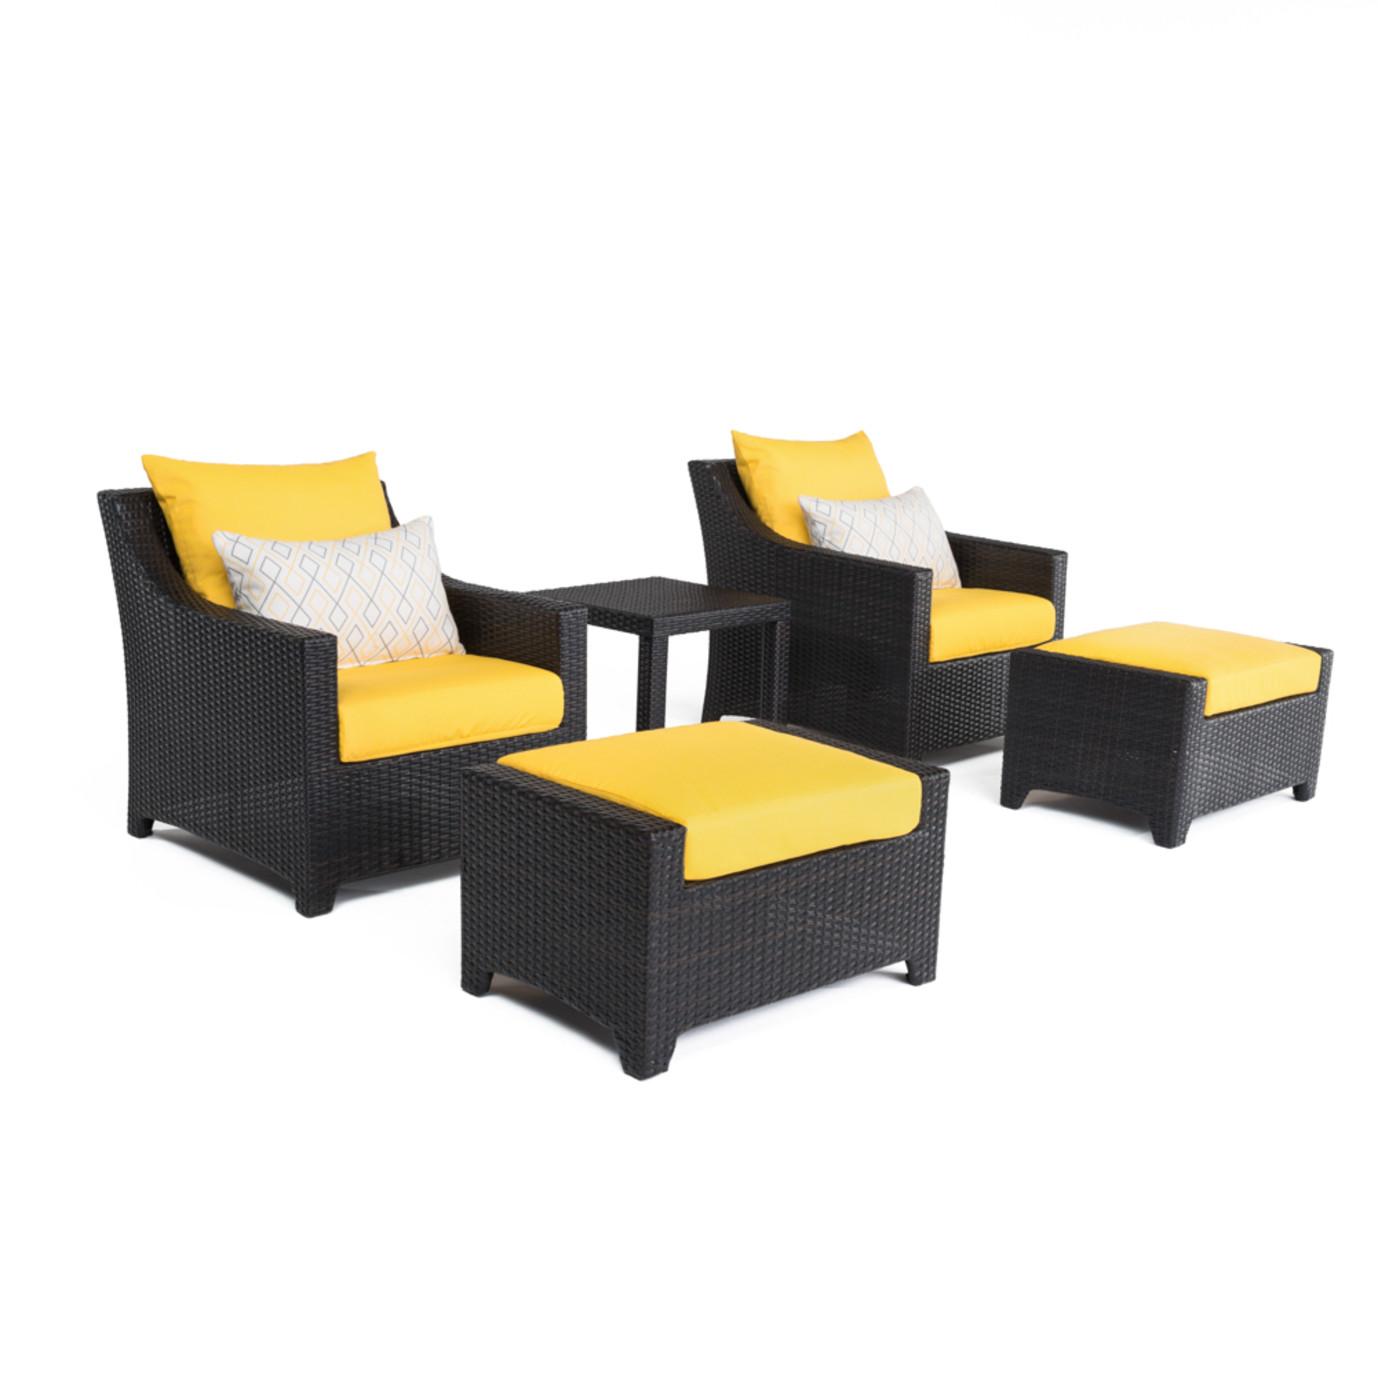 Deco™ 20pc Outdoor Estate Set - Sunflower Yellow